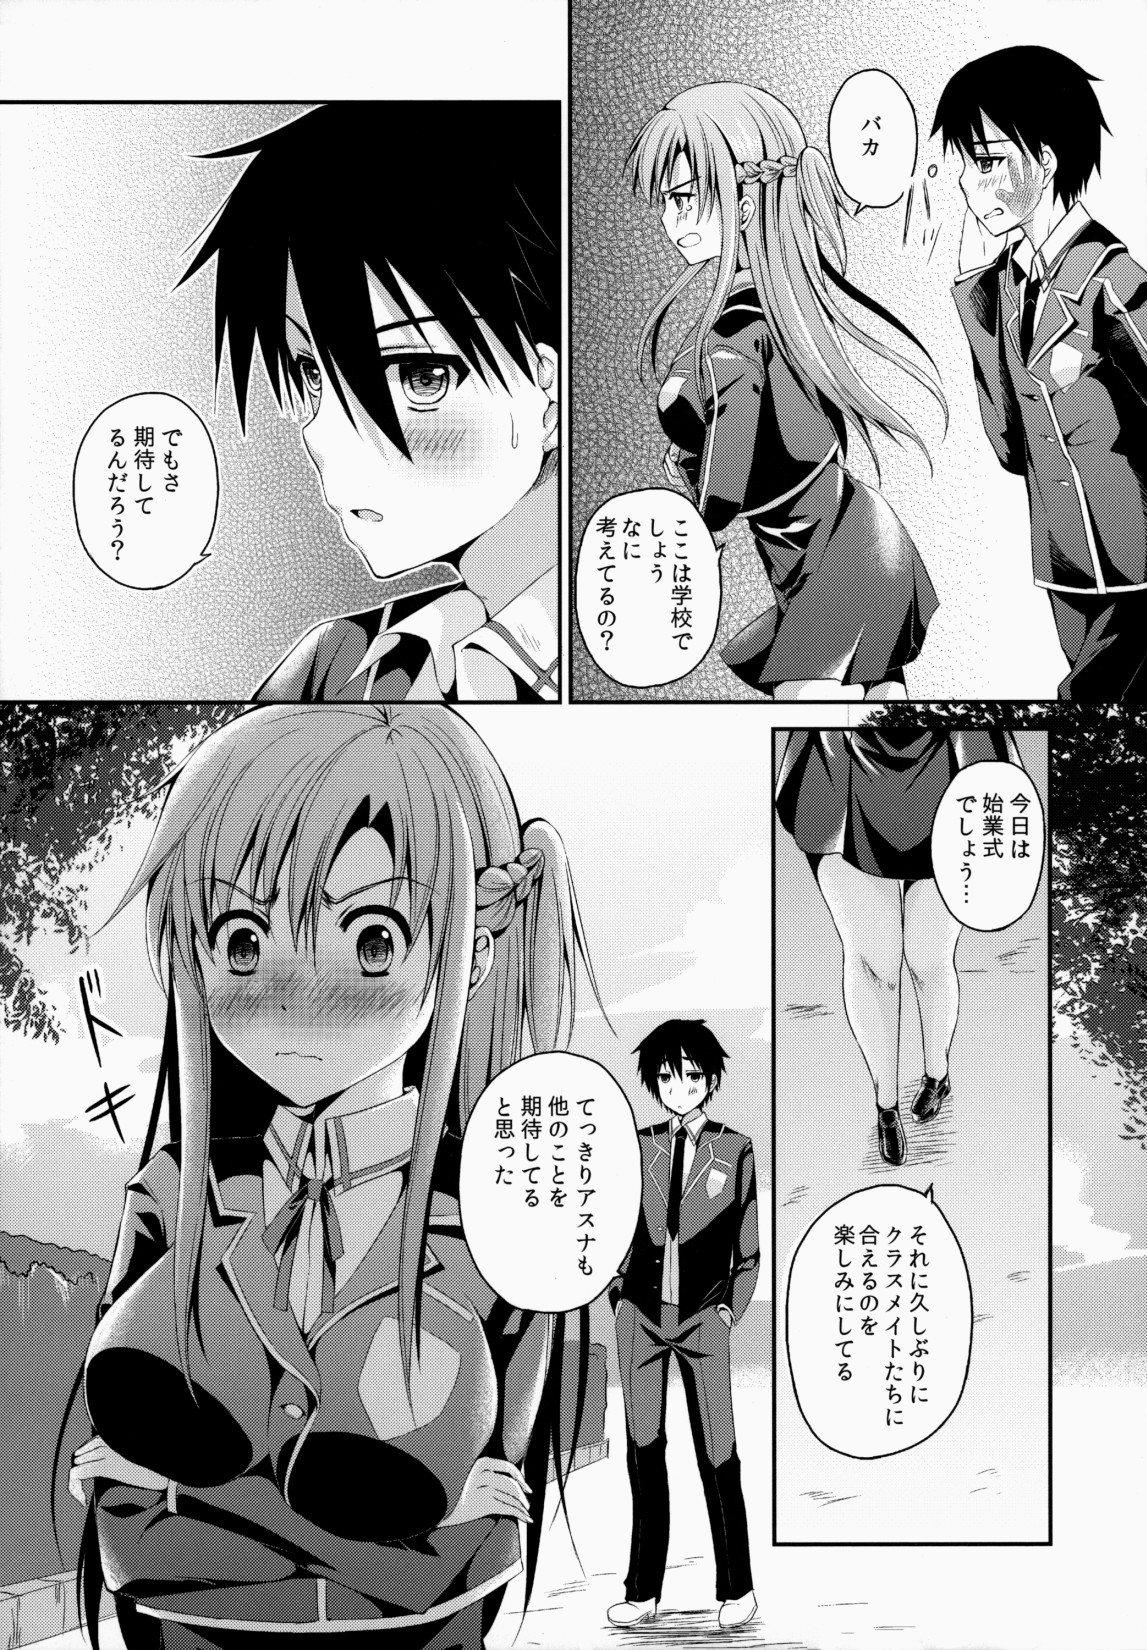 【※SAOエロ同人誌】JKって学校帰り制服で青姦しまくってるの?教えてエロい人www【ソードアート・オンライン】